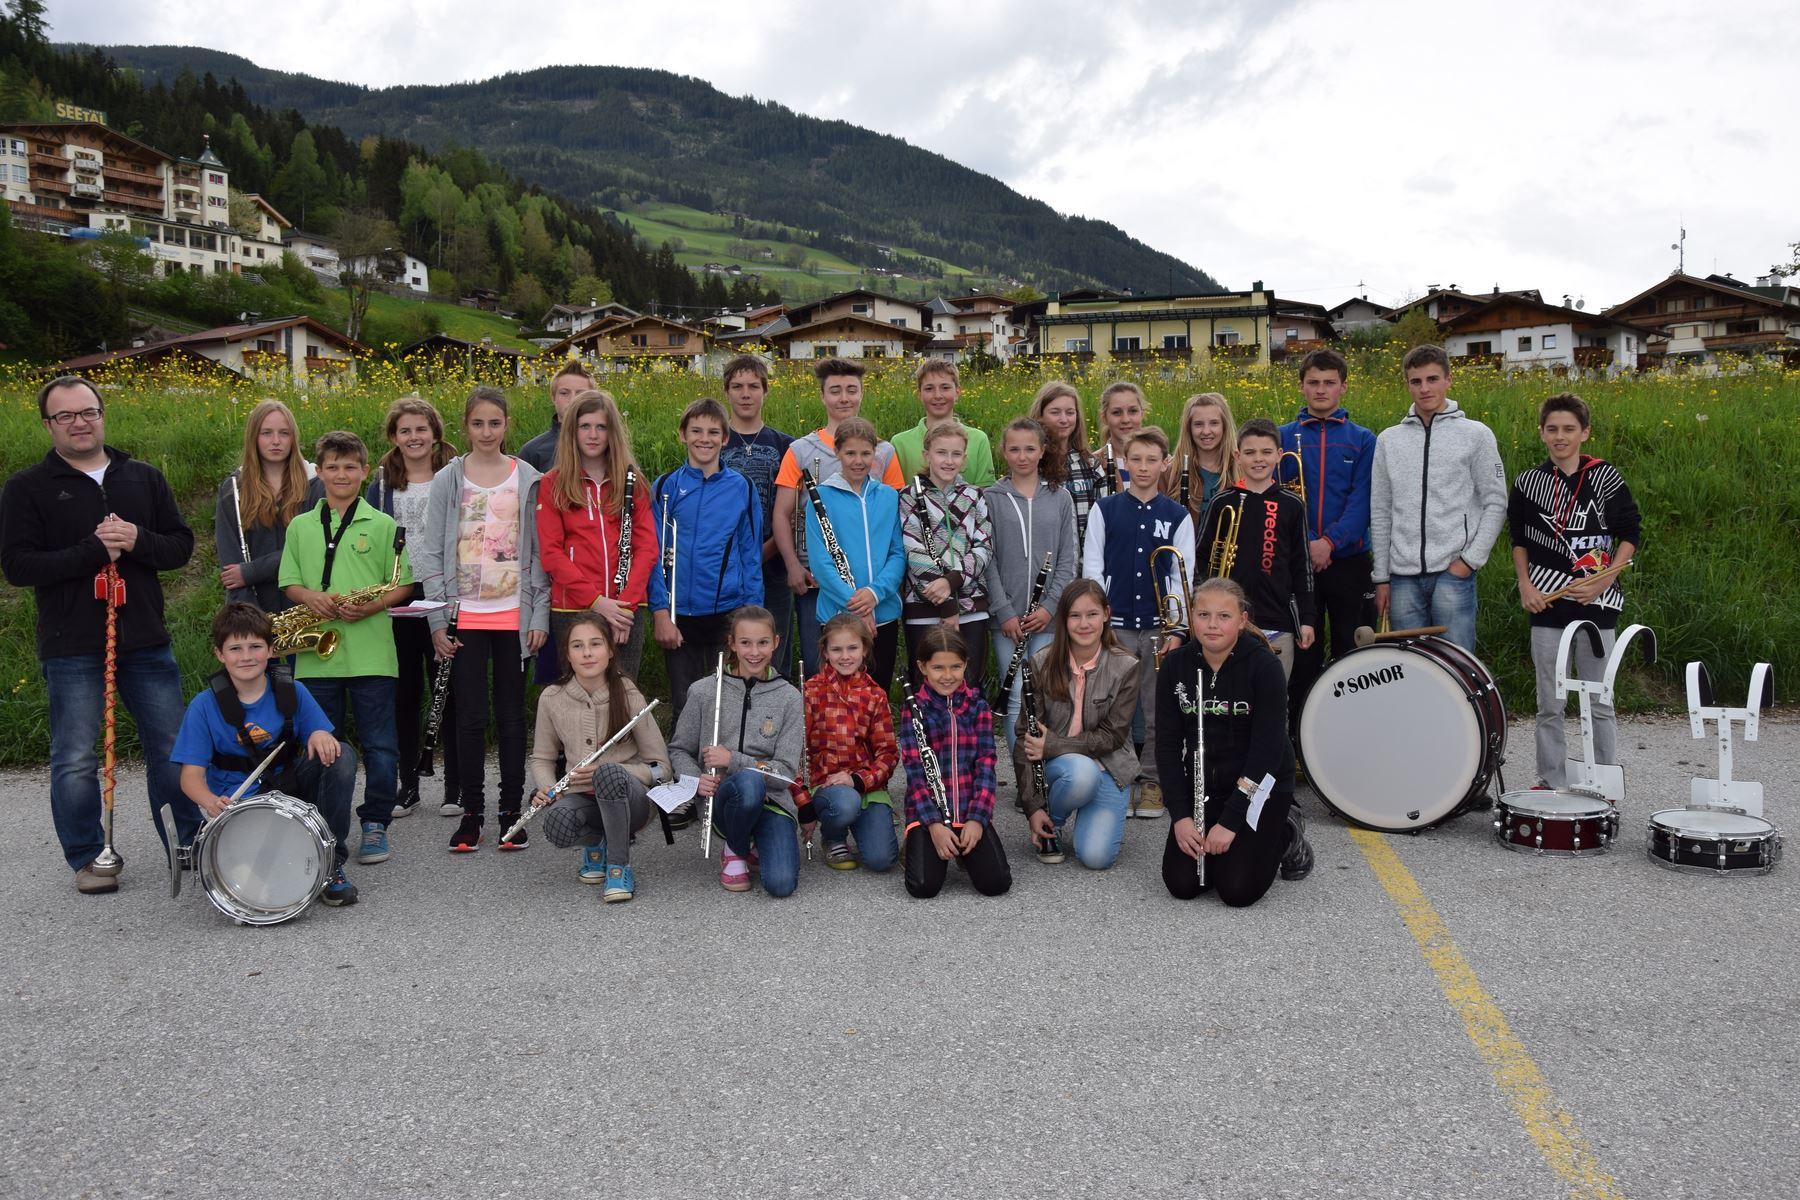 2015-05-02 Marschierprobe Jugend (25).jpg